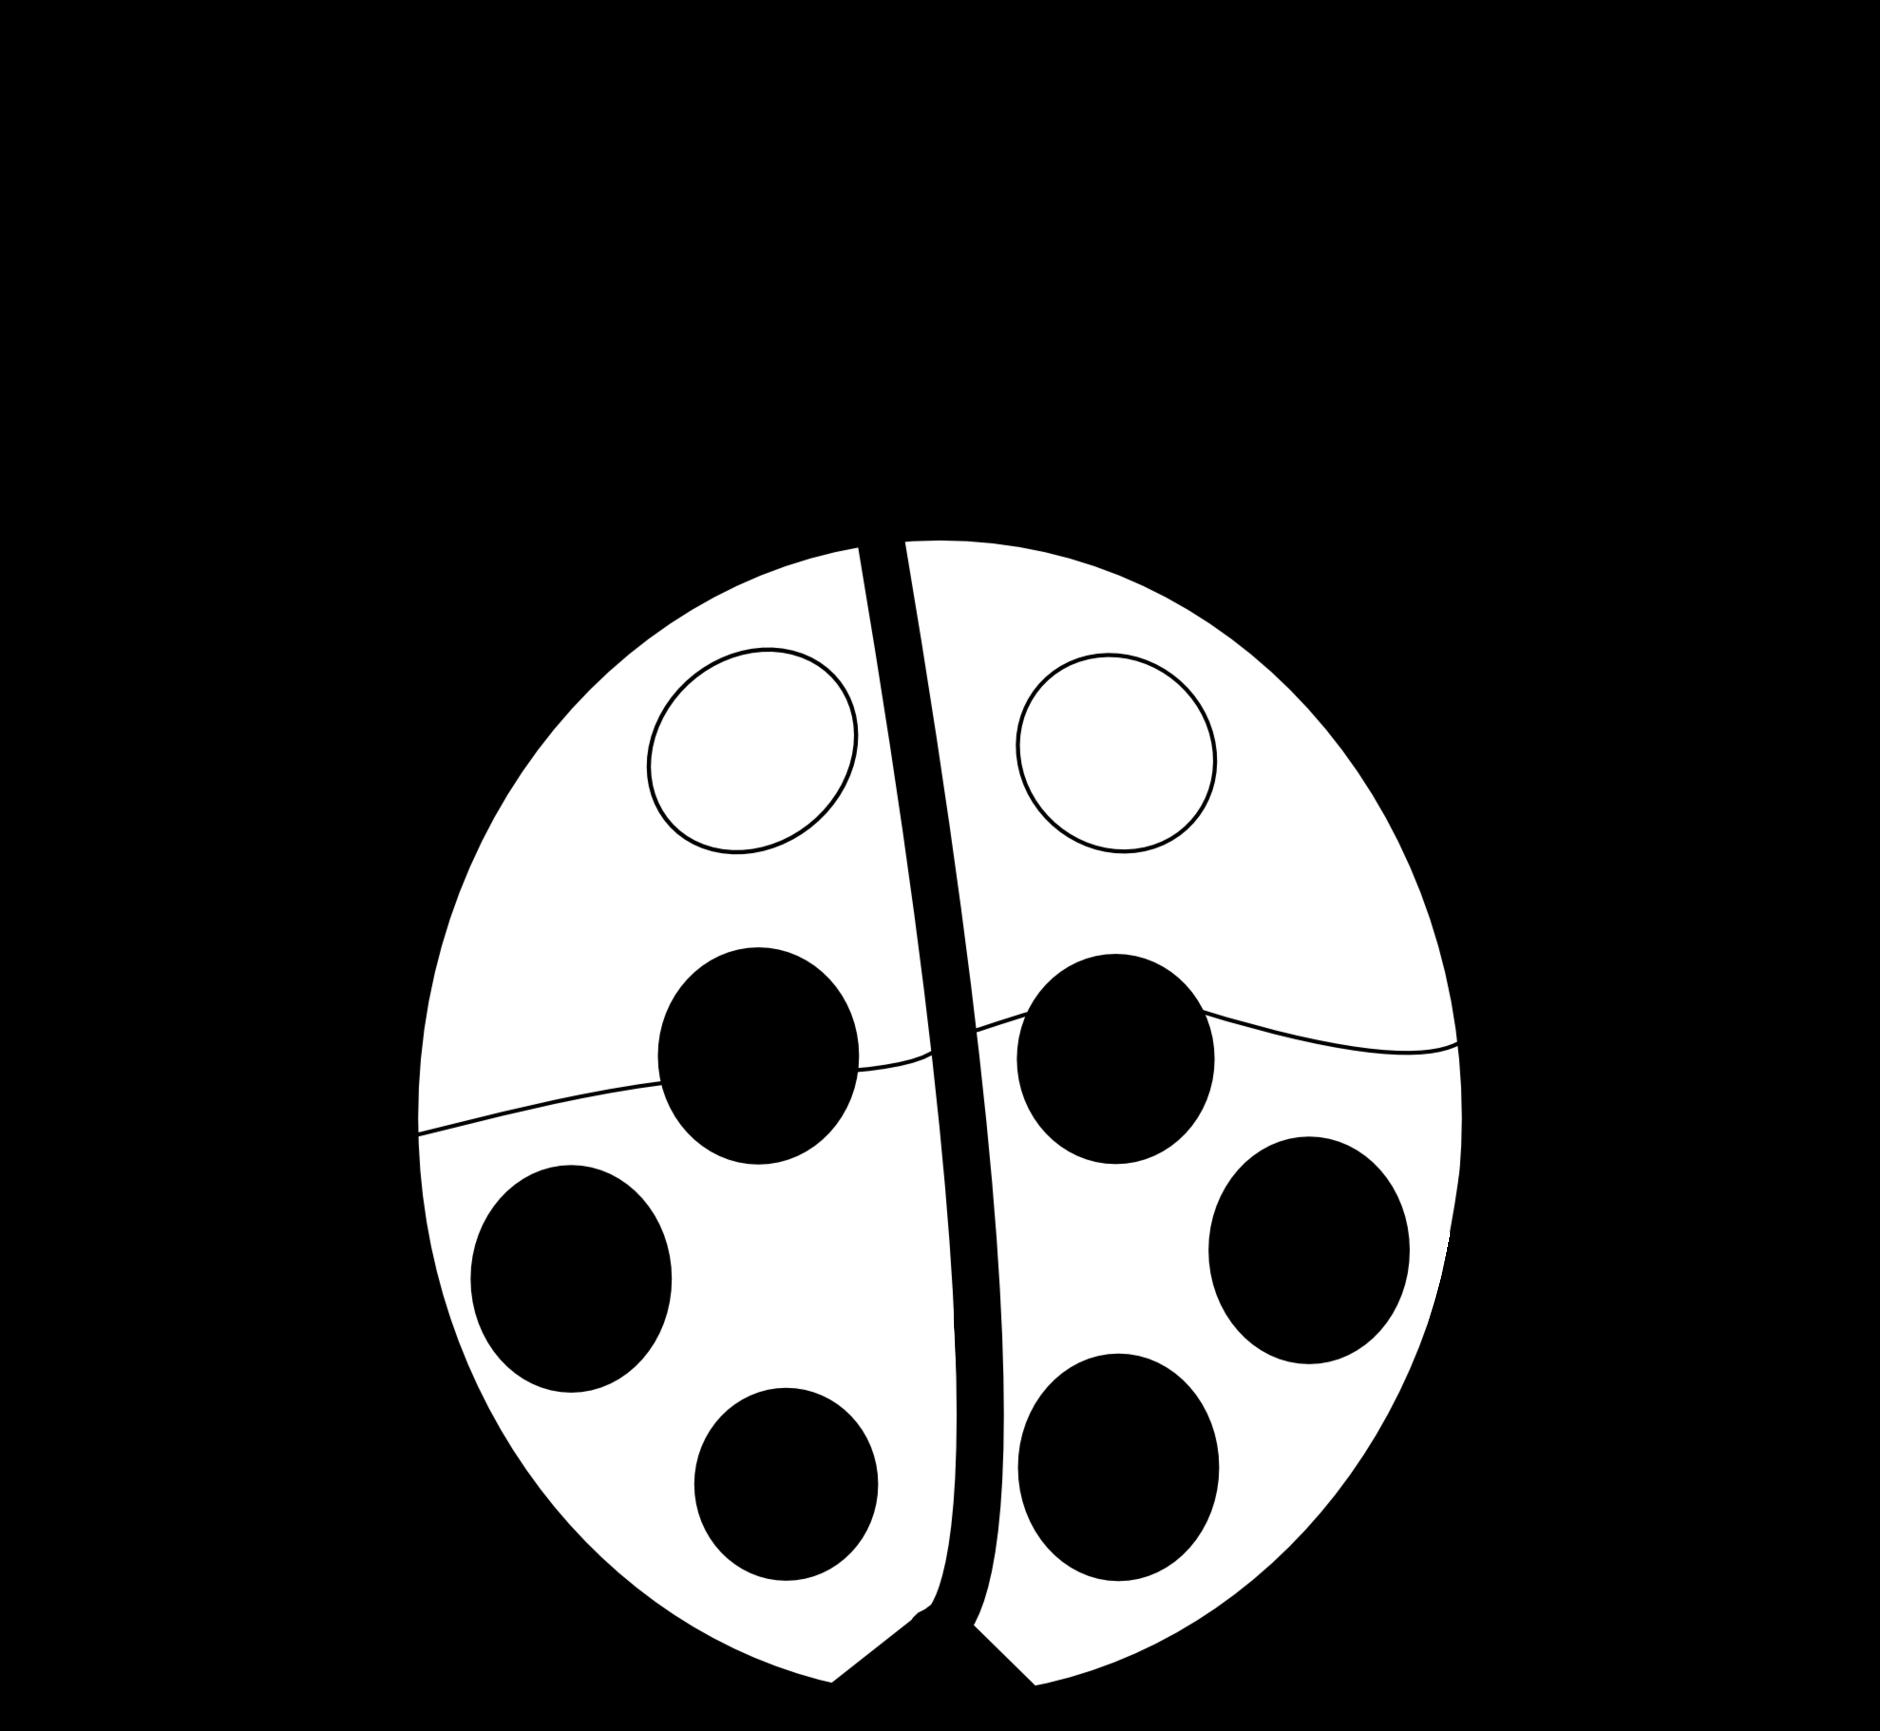 Black bug clipart jpg library stock Free Bug Cliparts Black, Download Free Clip Art, Free Clip Art on ... jpg library stock